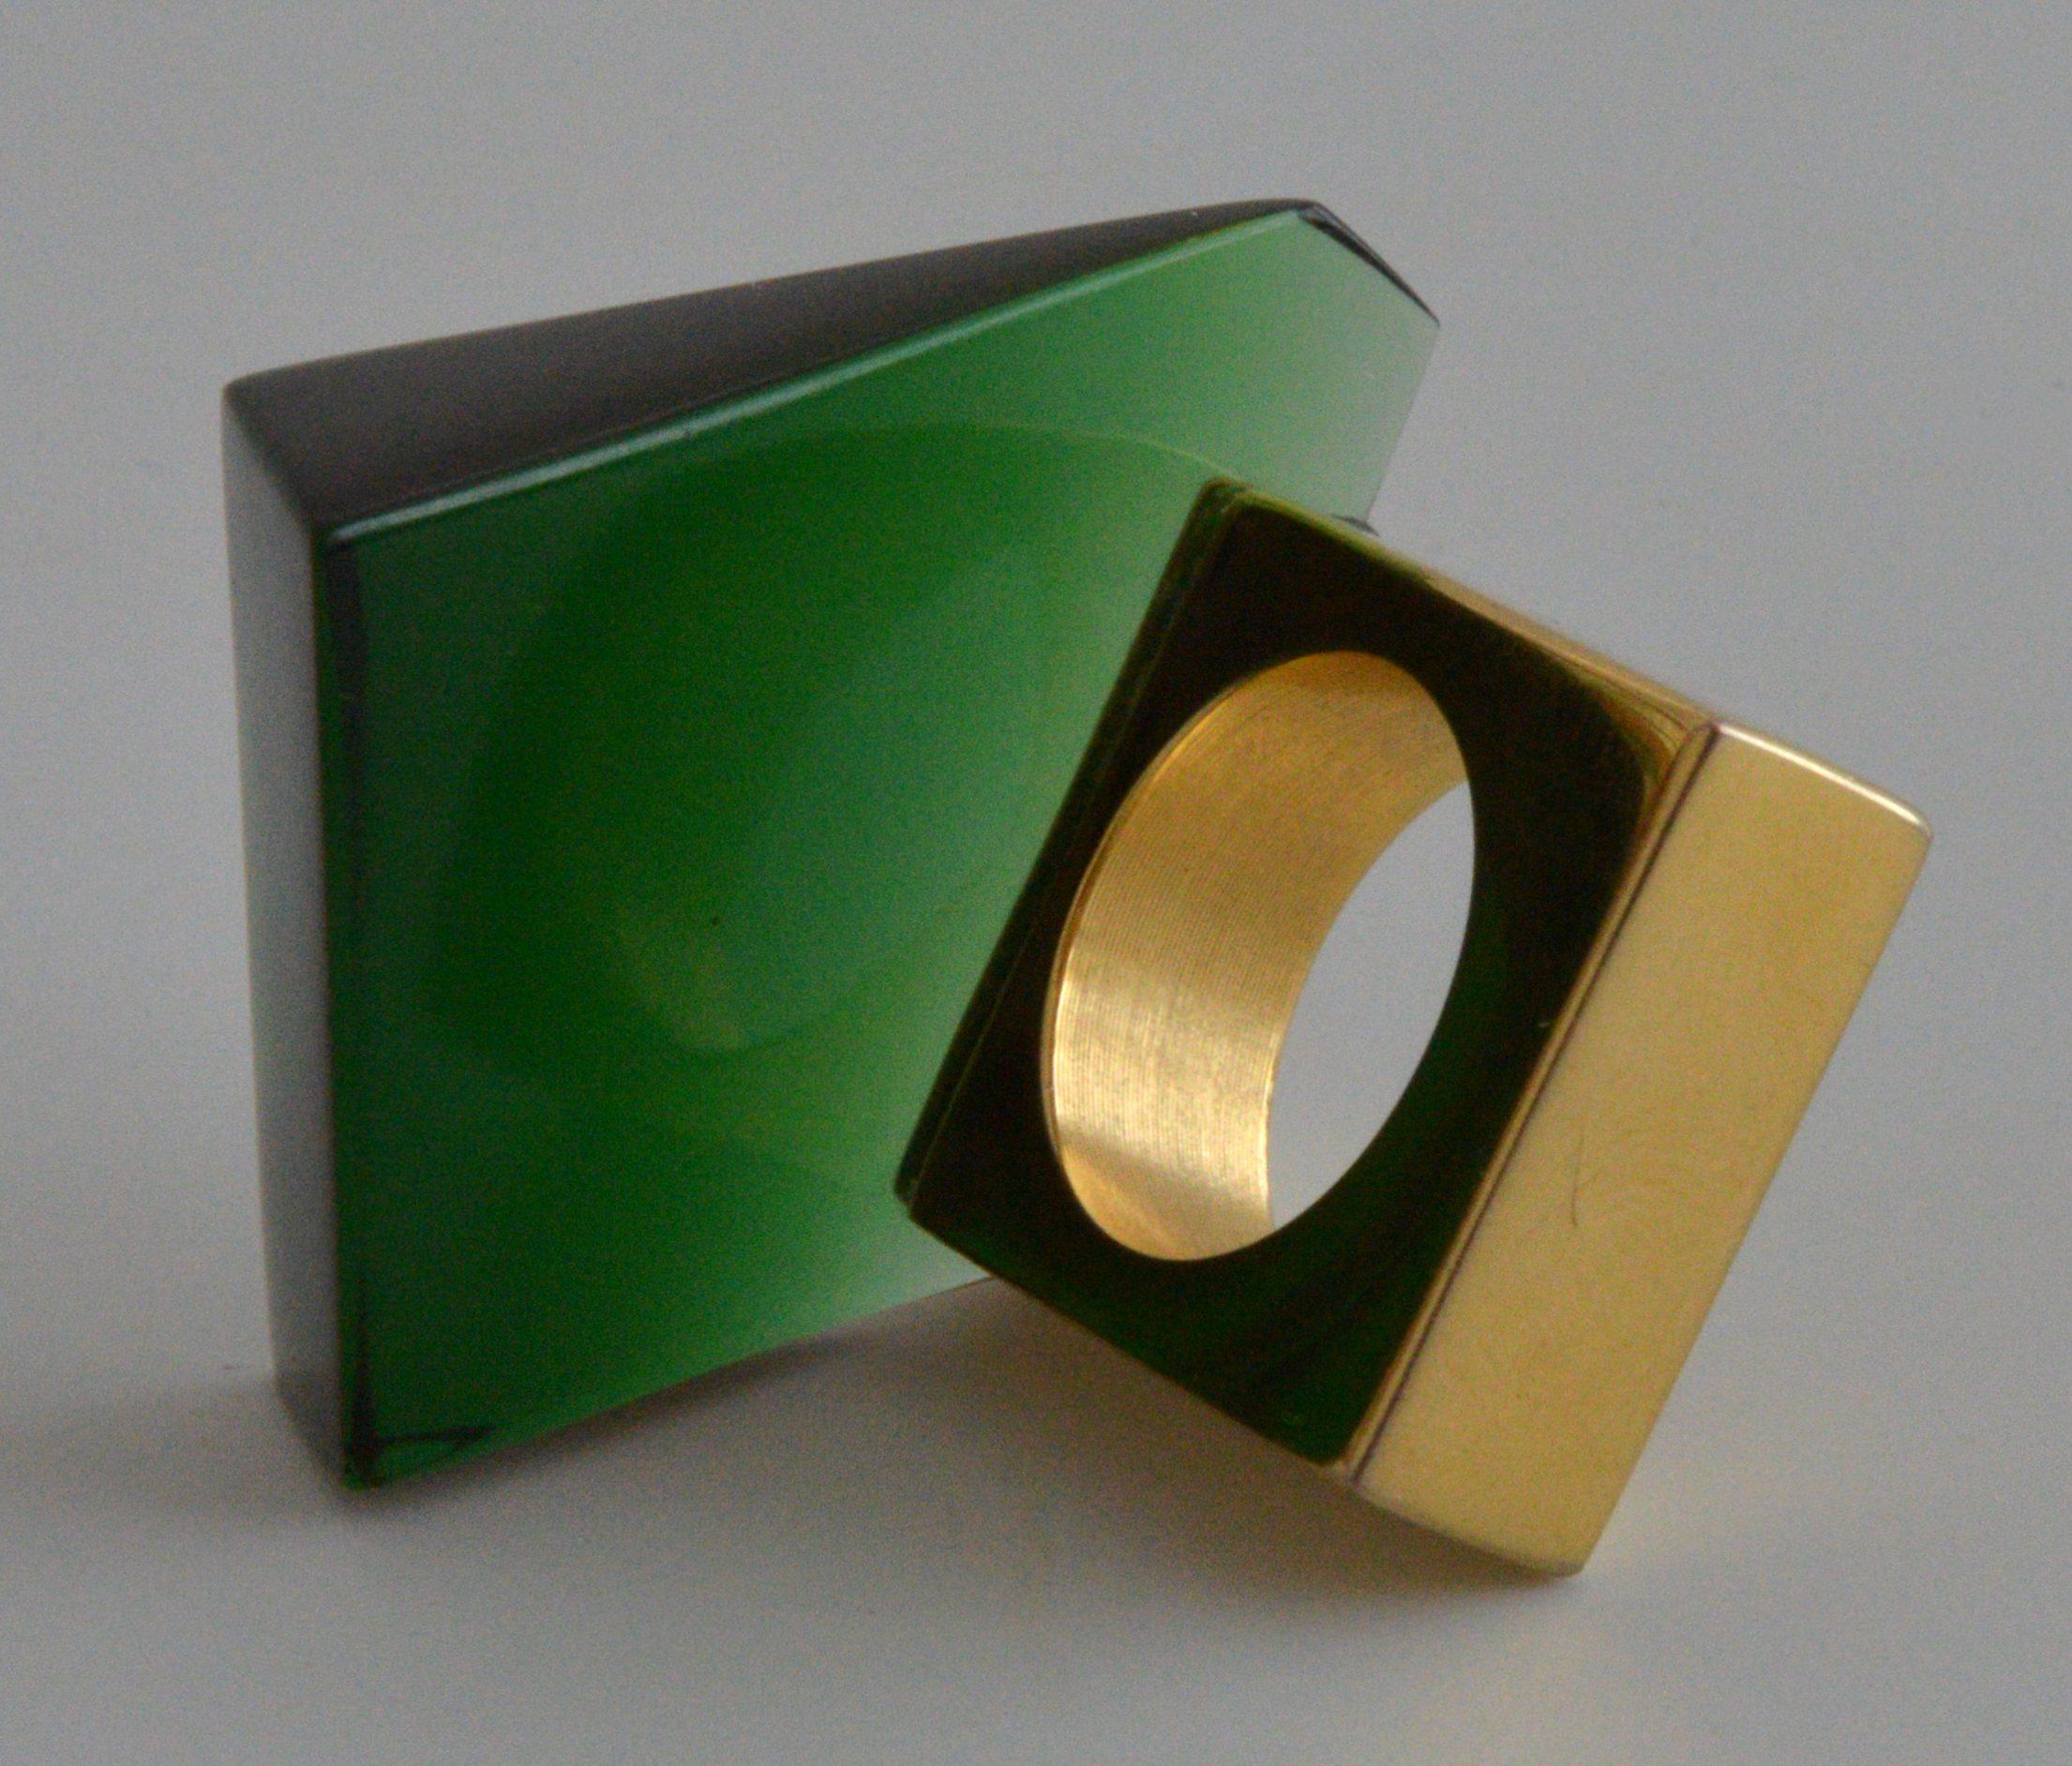 Svatopluk Kasalý, ring, 2002, glas, goud, messing Particuliere collectie